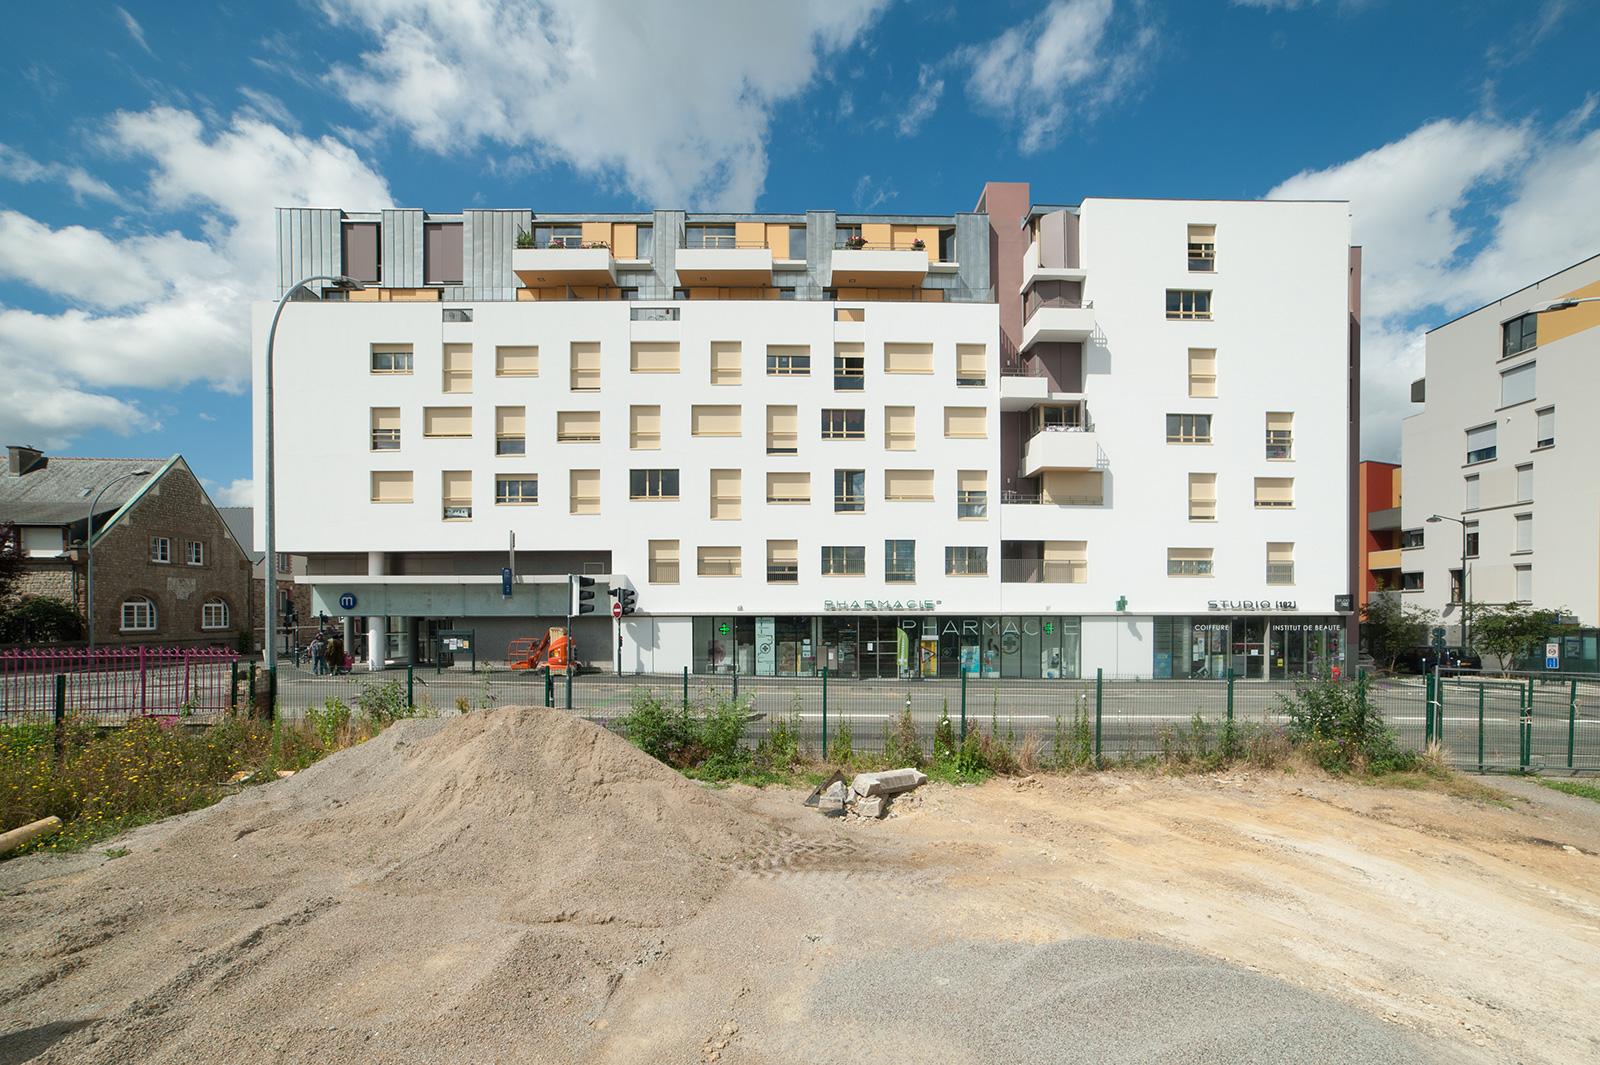 germe-et-jam-RJC-rennes-immeuble-cartier-facade-rue-alma-03